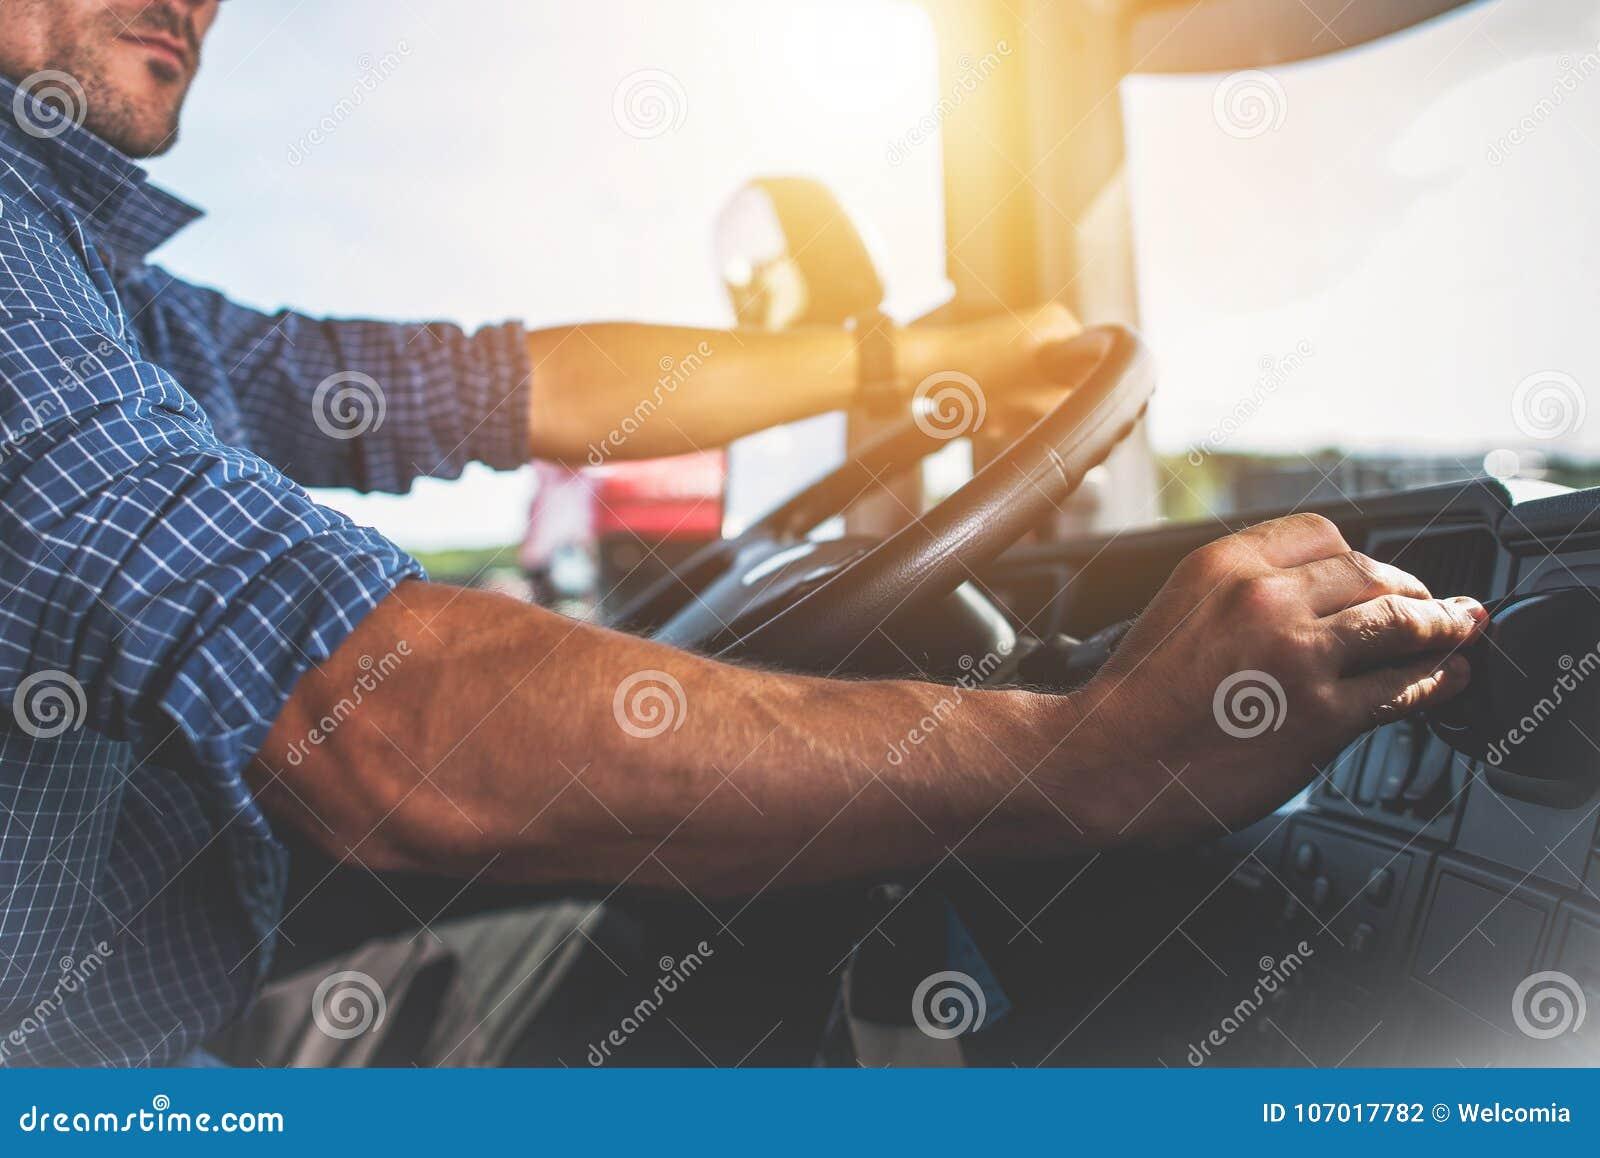 Halb LKW-Fahrer Job